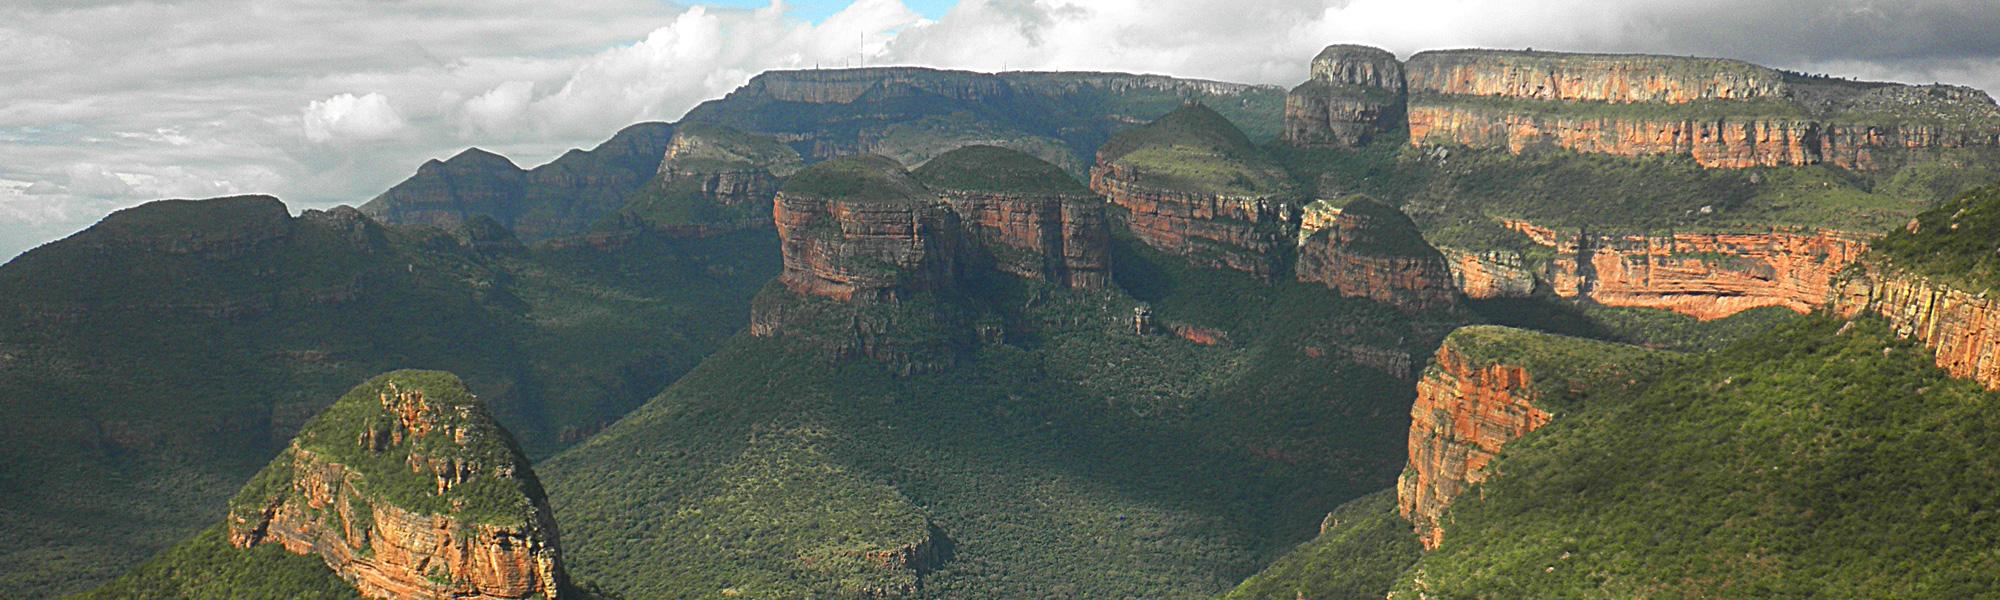 African Feeling - Johannesburg mit Krüger Nationalpark, Swasiland, Hluhluwe Nationalpark und den Drakensbergen